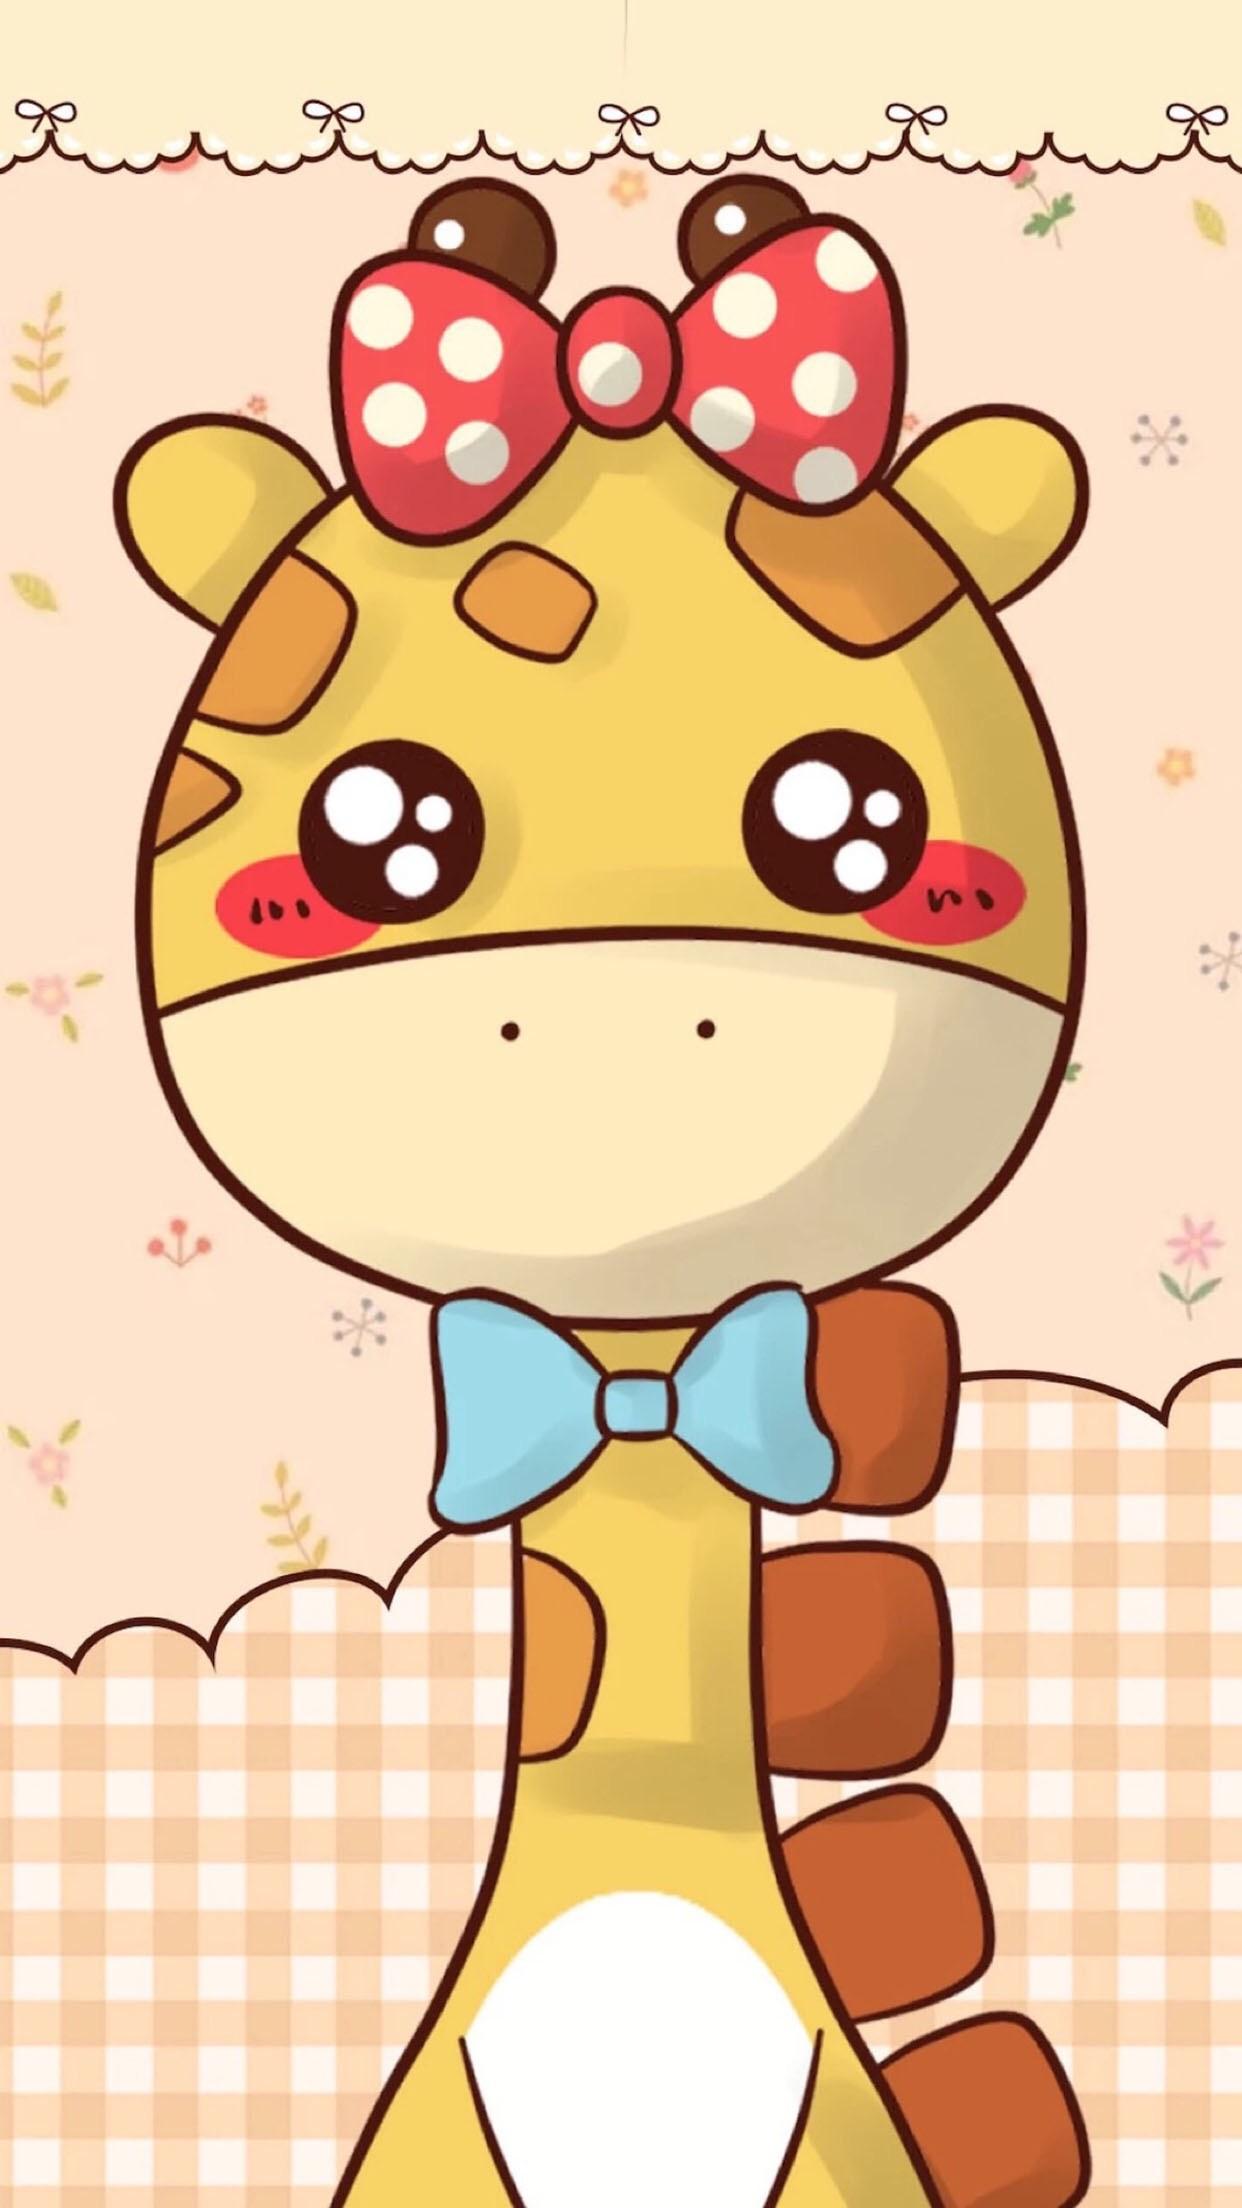 Cute Cartoon Giraffe Wallpaper Cute Giraffe Wallpaper 62 Images